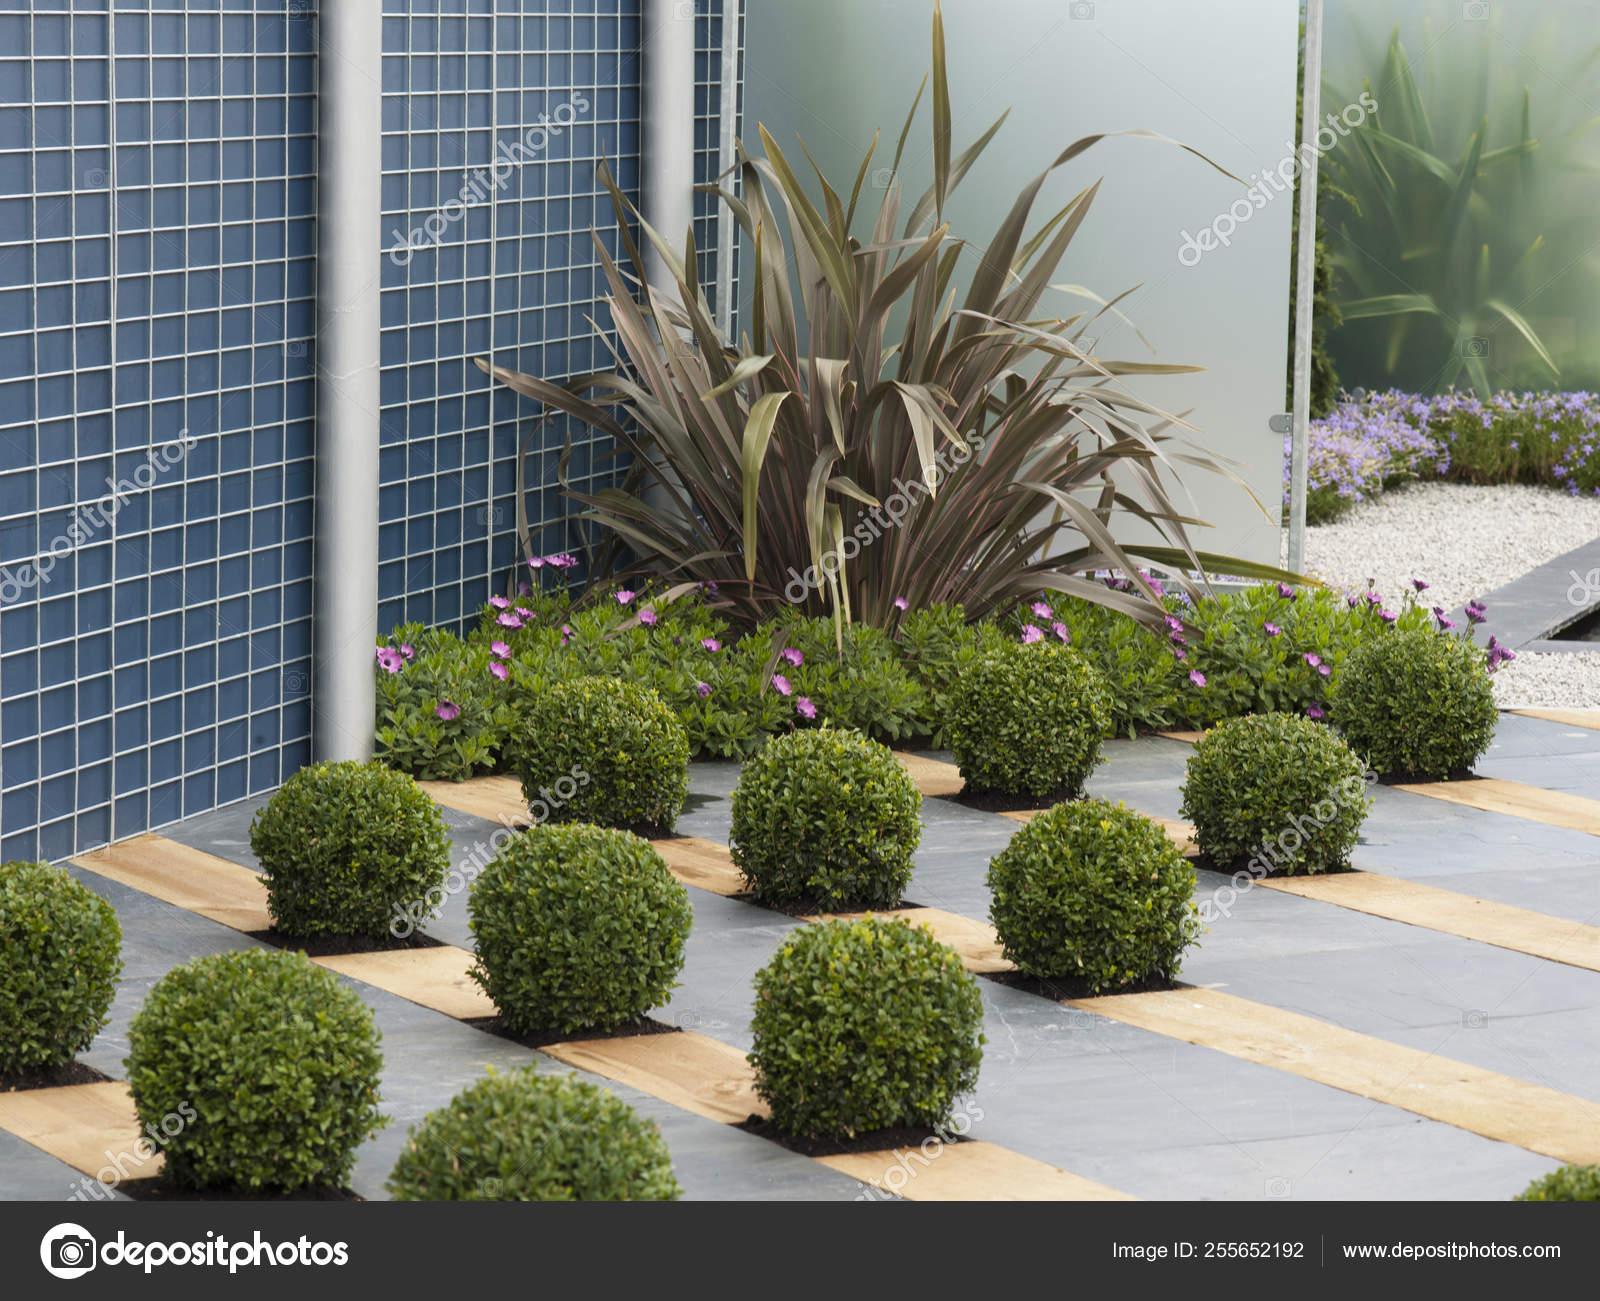 A Modern Garden With Creative Topiary Display In Paved Area Stock Photo C Gardenguru 255652192